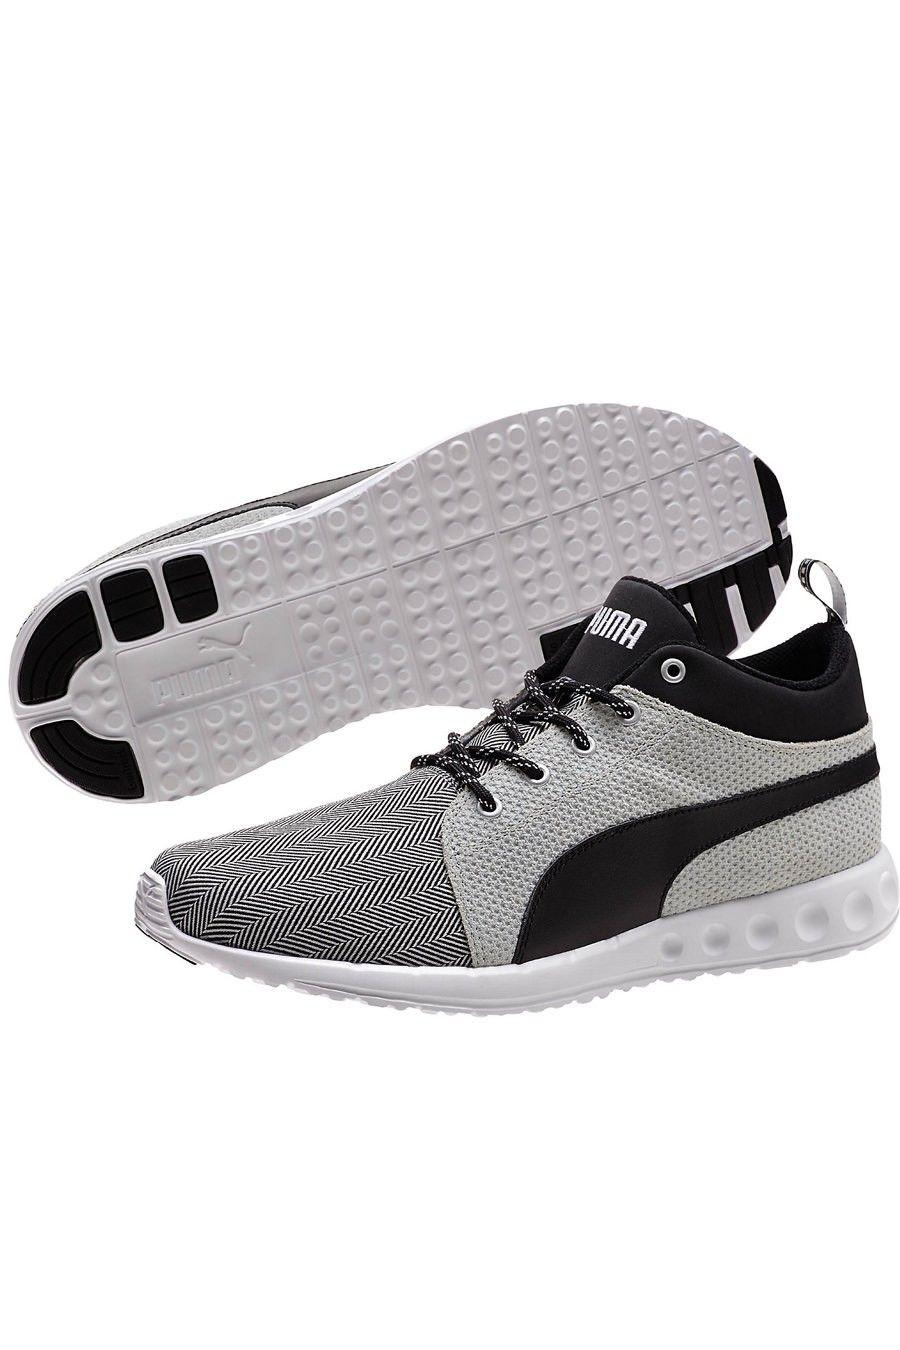 scarpe puma running